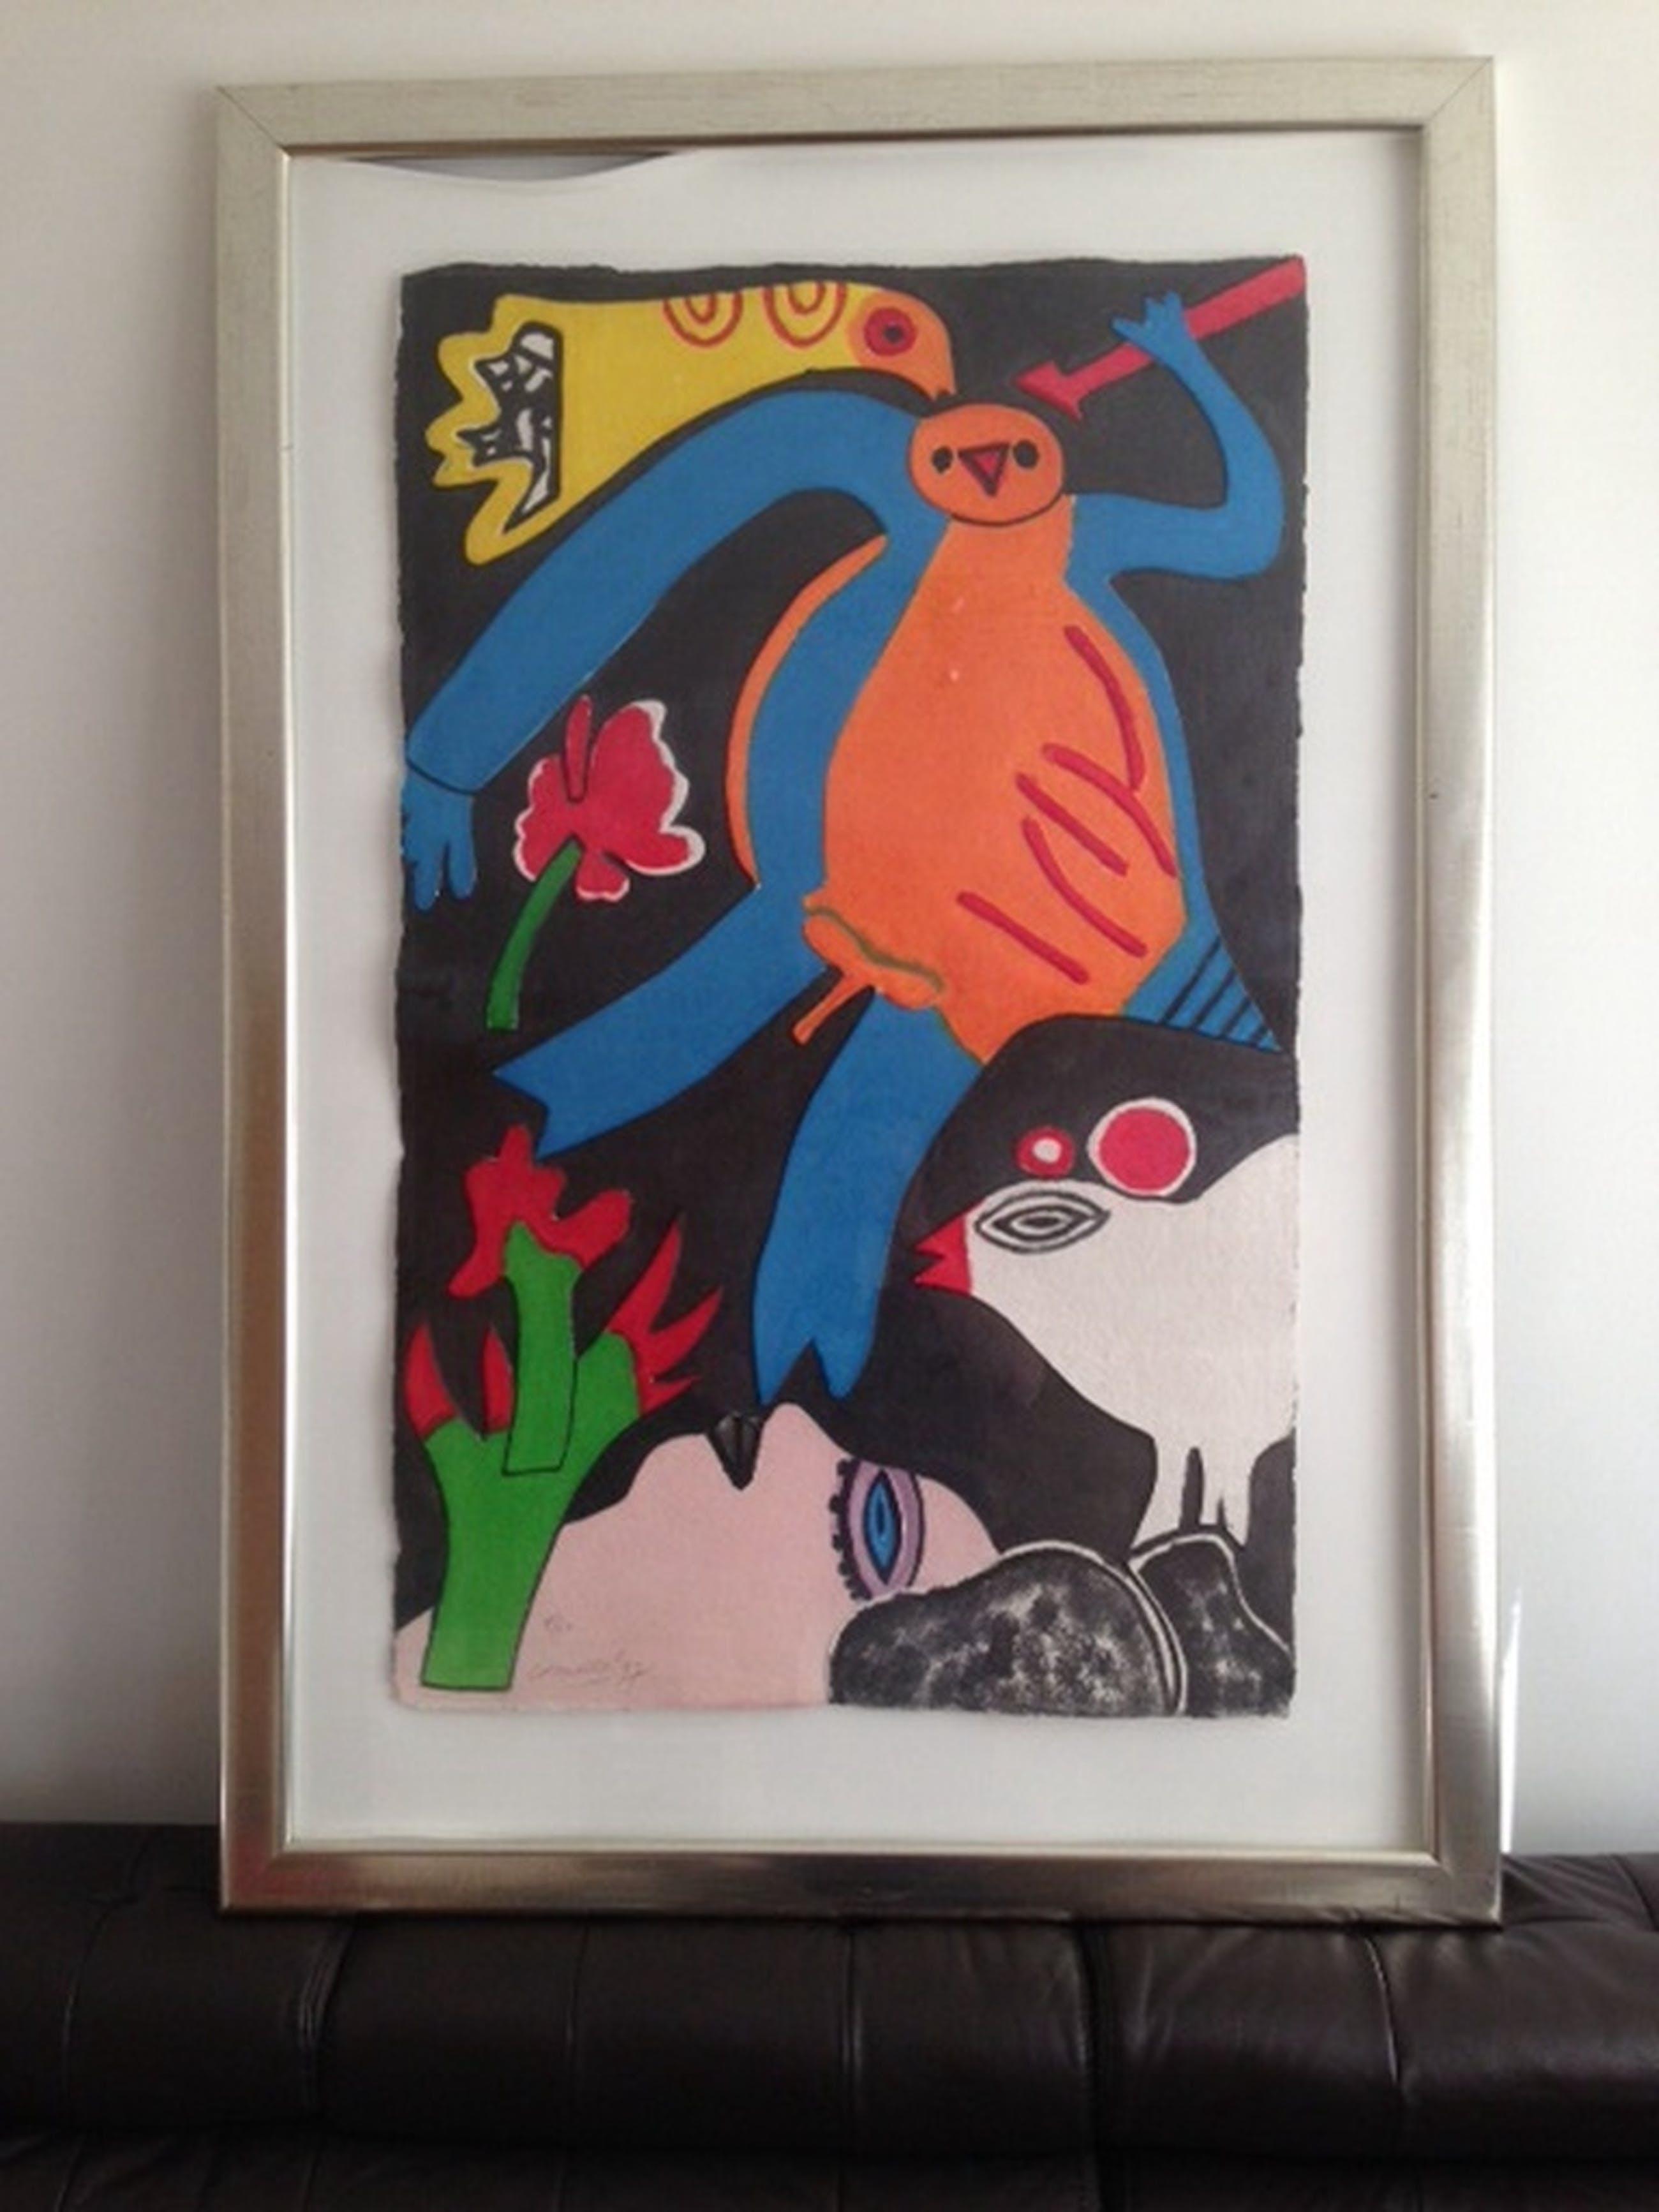 Corneille aquagravure l'oiseau jaune 1997 kopen? Bied vanaf 1100!